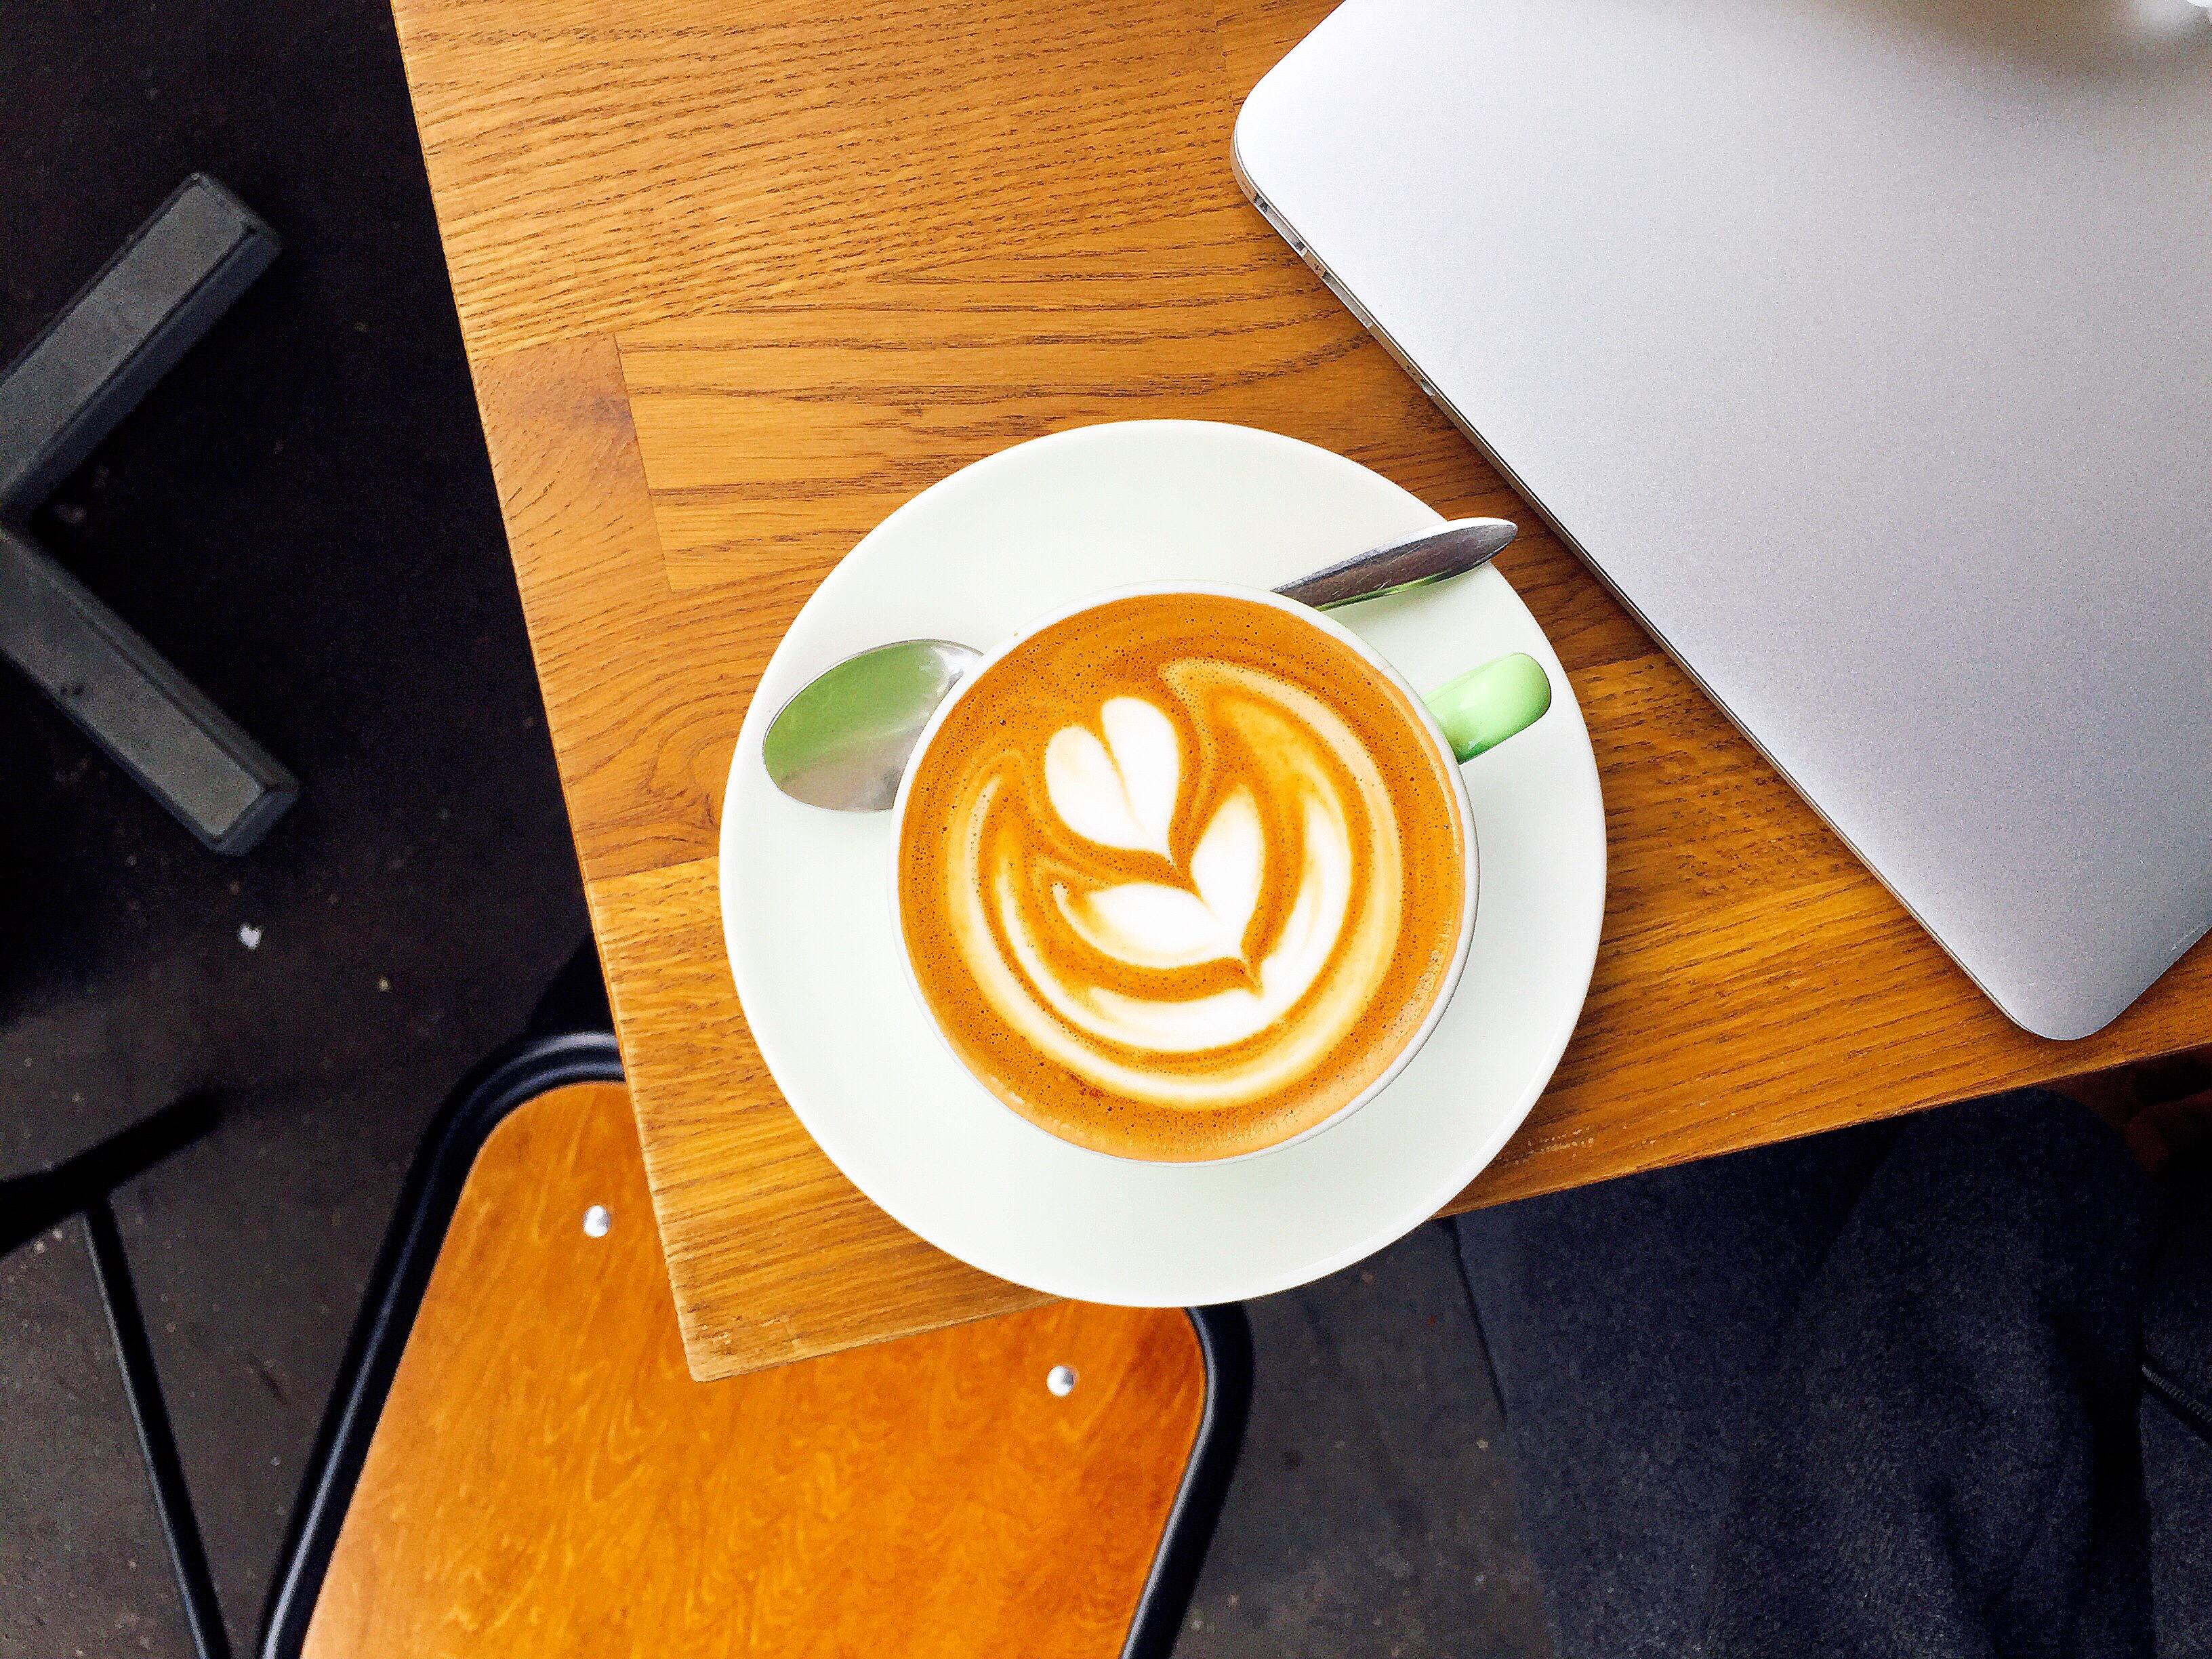 Fondation Café, just like in Australia